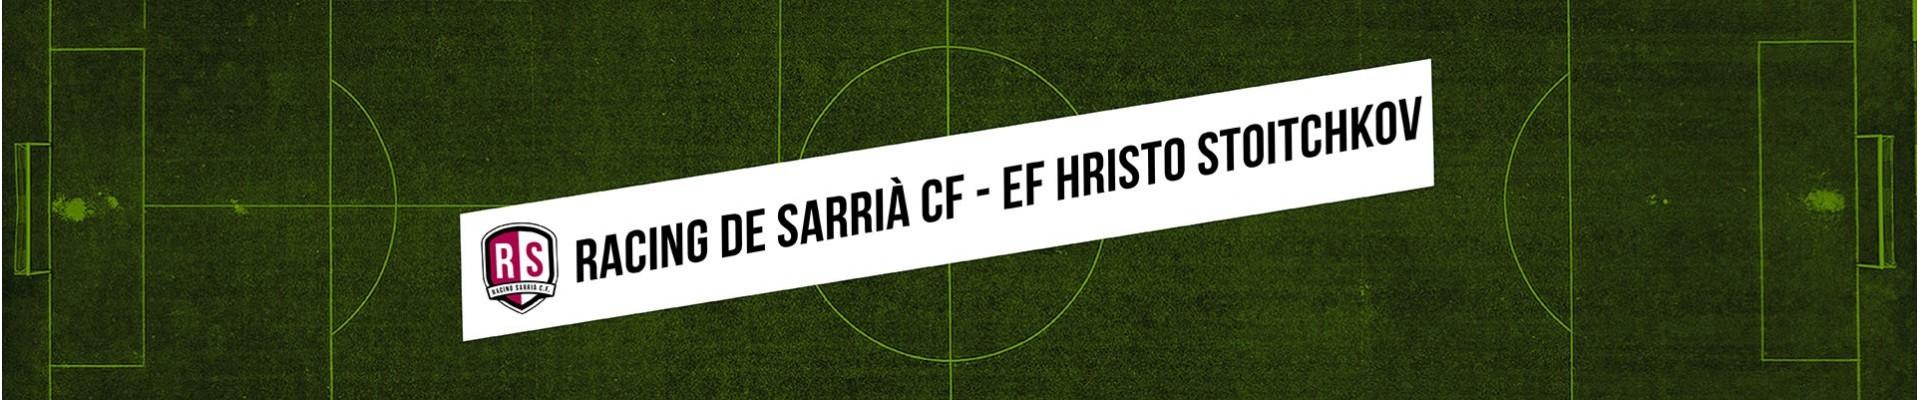 RACING DE SARRIA CF- EF HRISTO STOITCHKOV